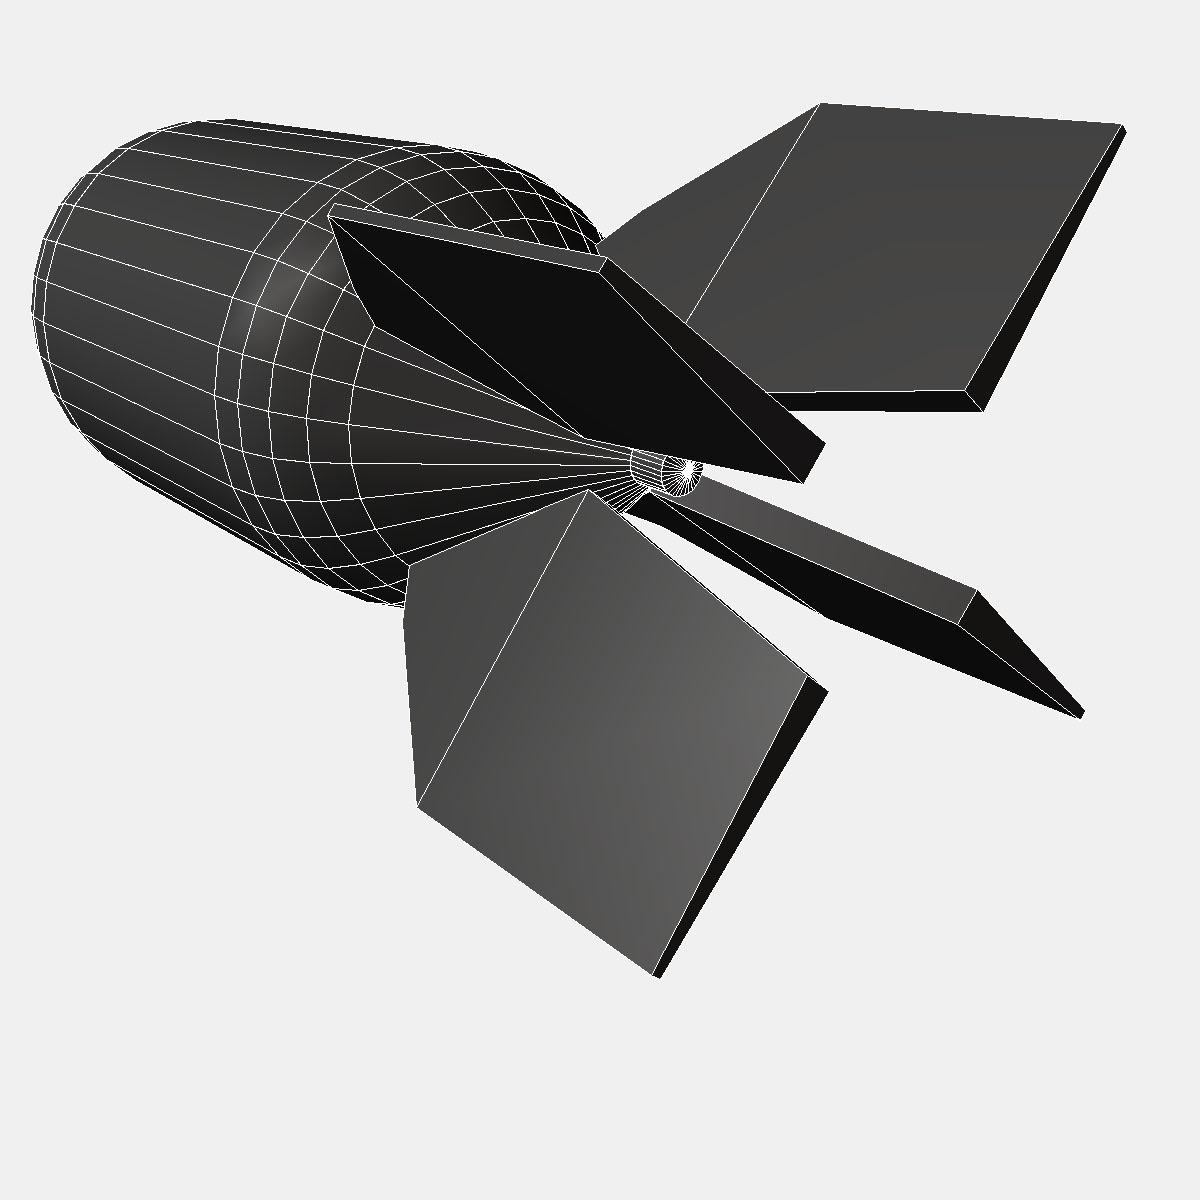 Nuclear schemed bomb 3d model 3ds dxf fbx blend cob dae X obj 162661